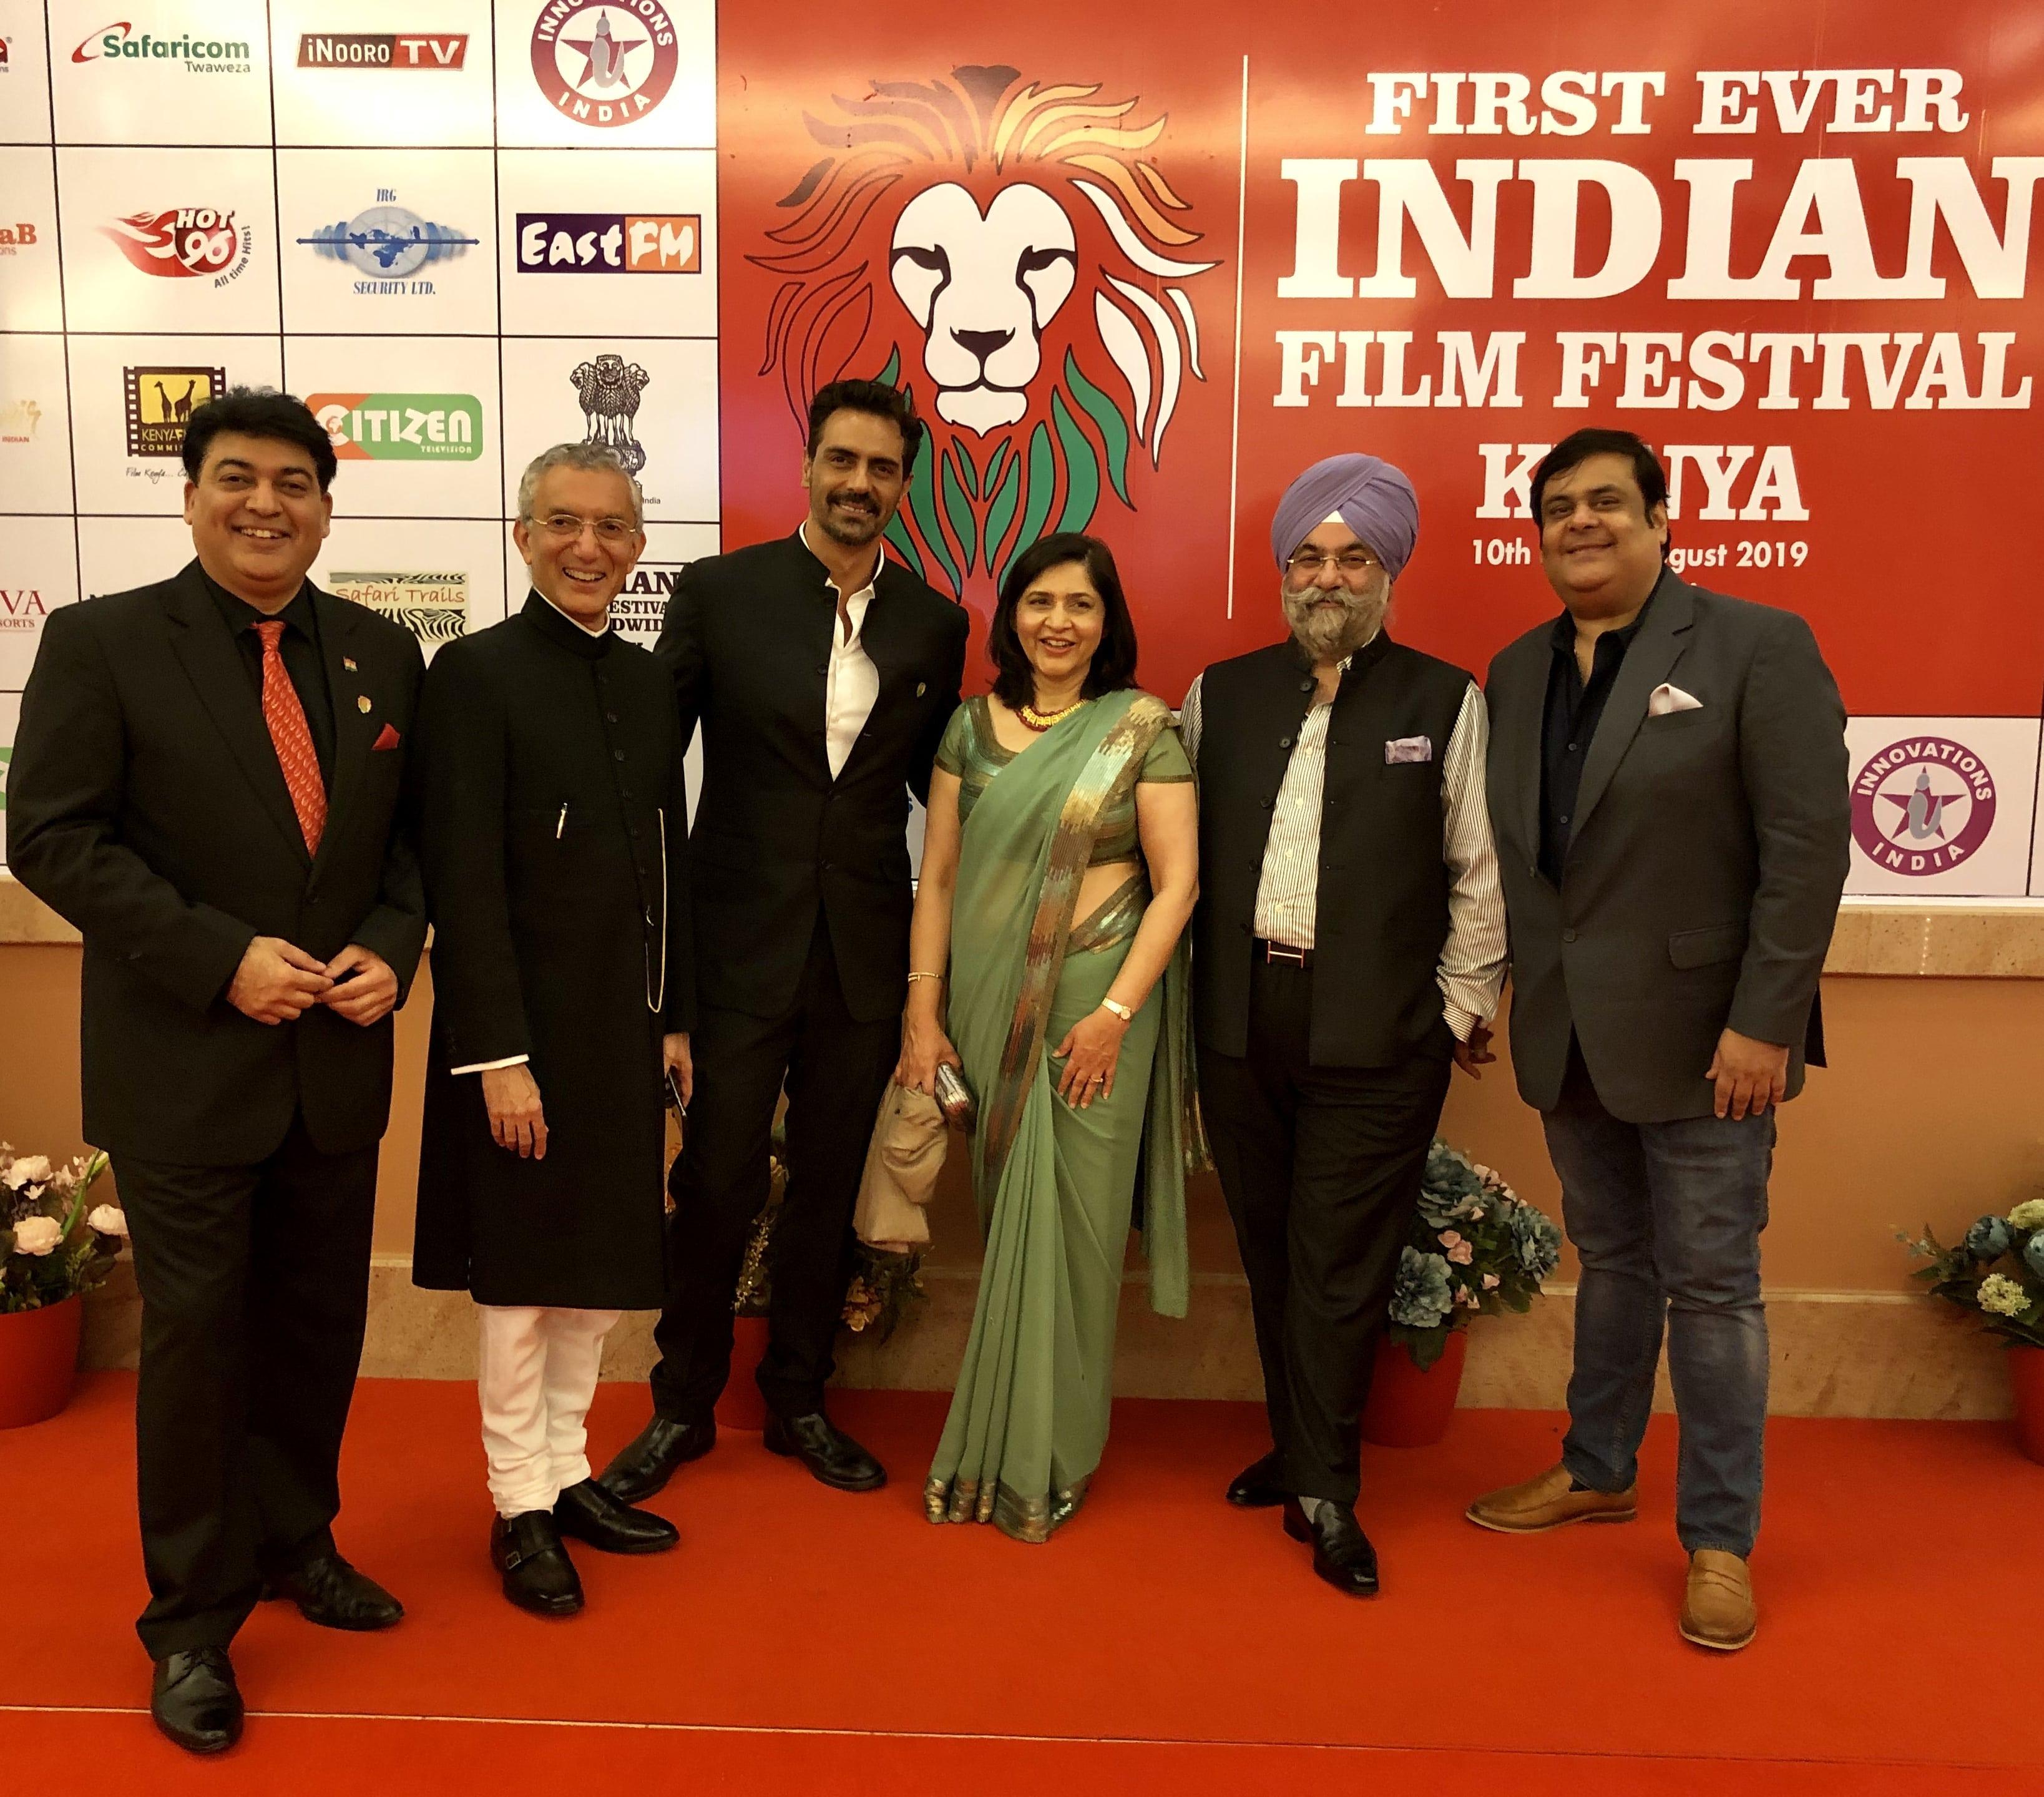 Raju Chadha, Arjun Rampal & Rahul Mittra Felicitated At The Indian Film Festival Kenya